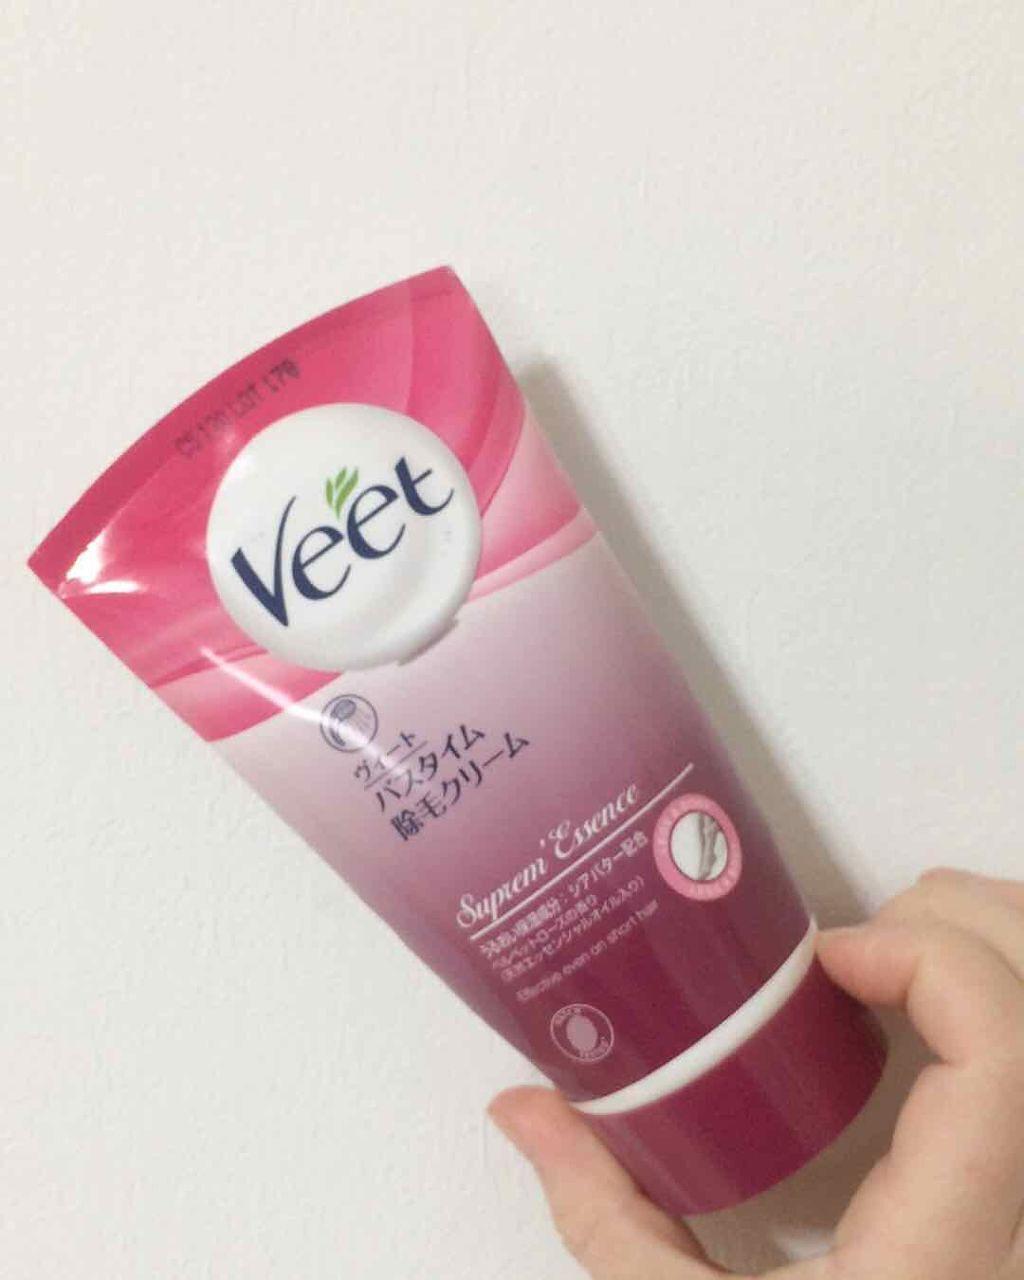 Veet(ヴィート),ヴィート ナチュラルズ バスタイム除毛クリーム しっかり除毛